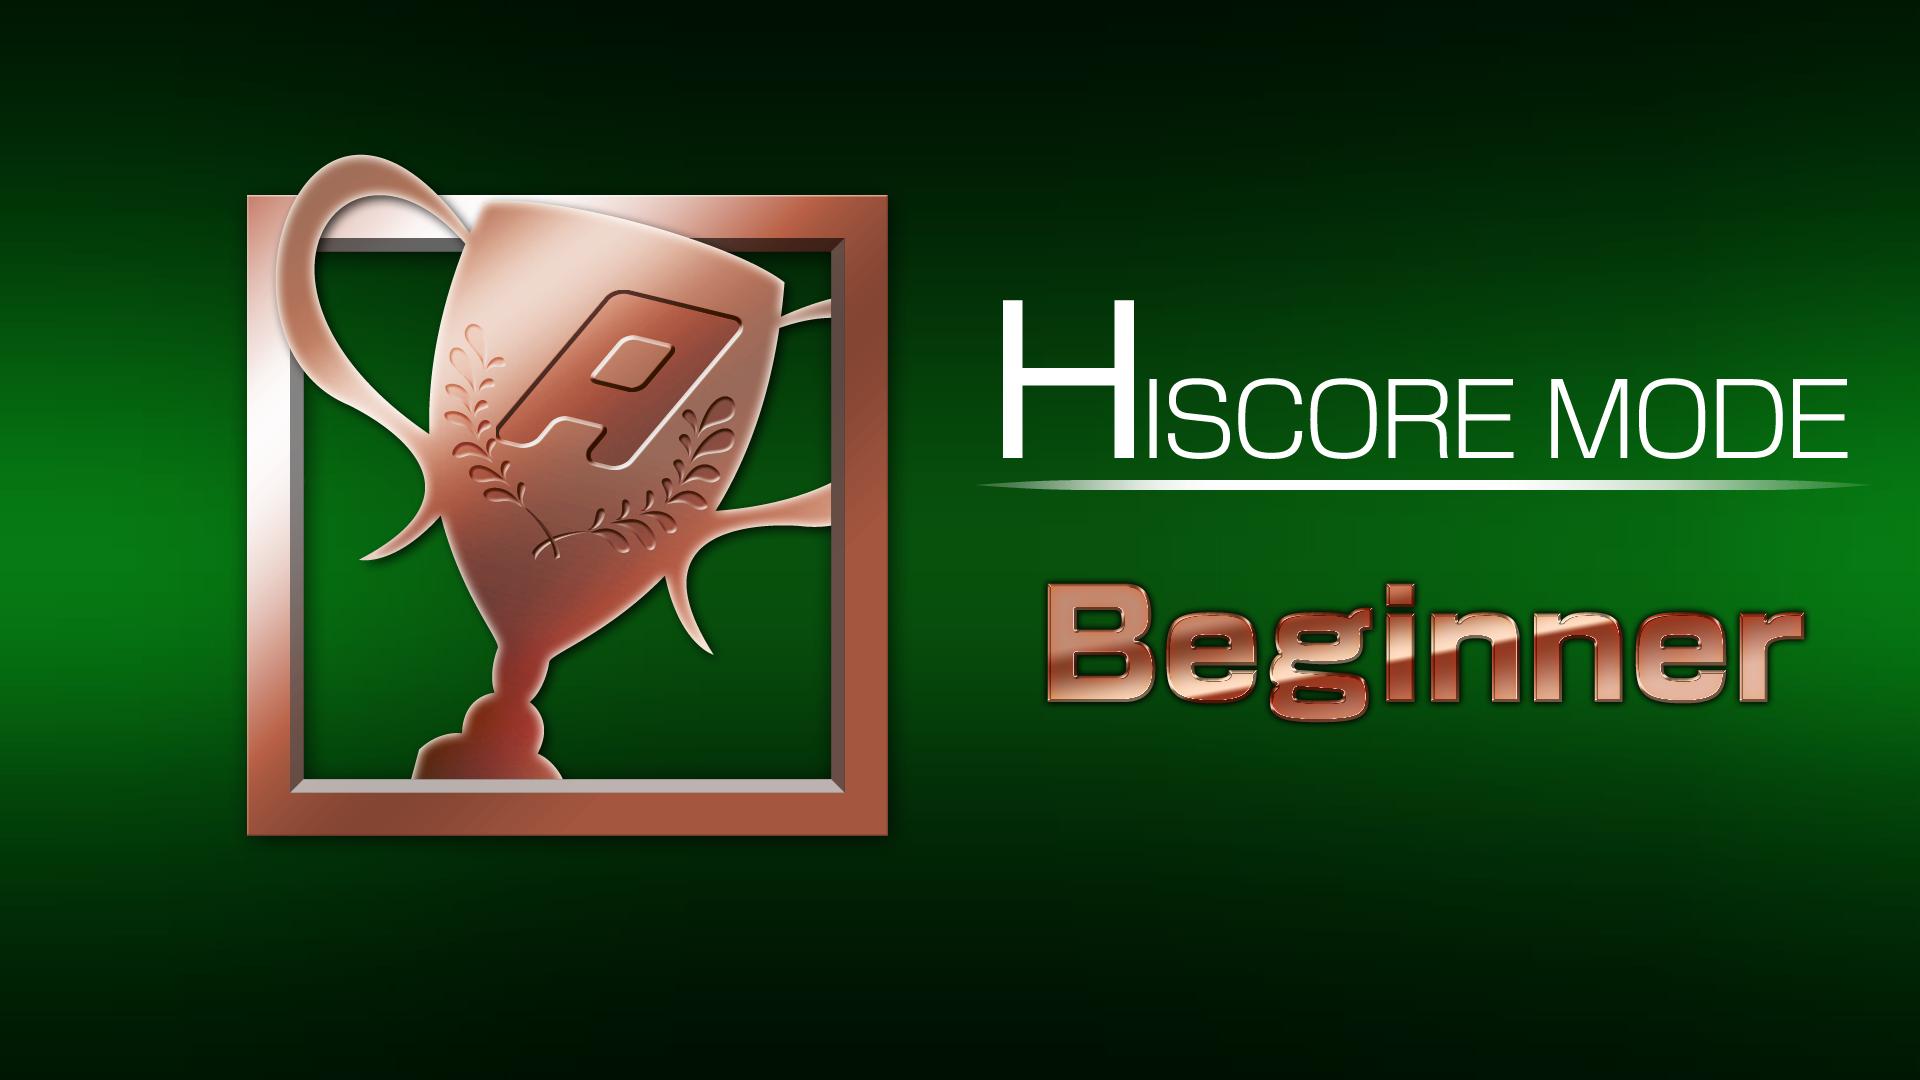 Icon for HI SCORE MODE 200 points